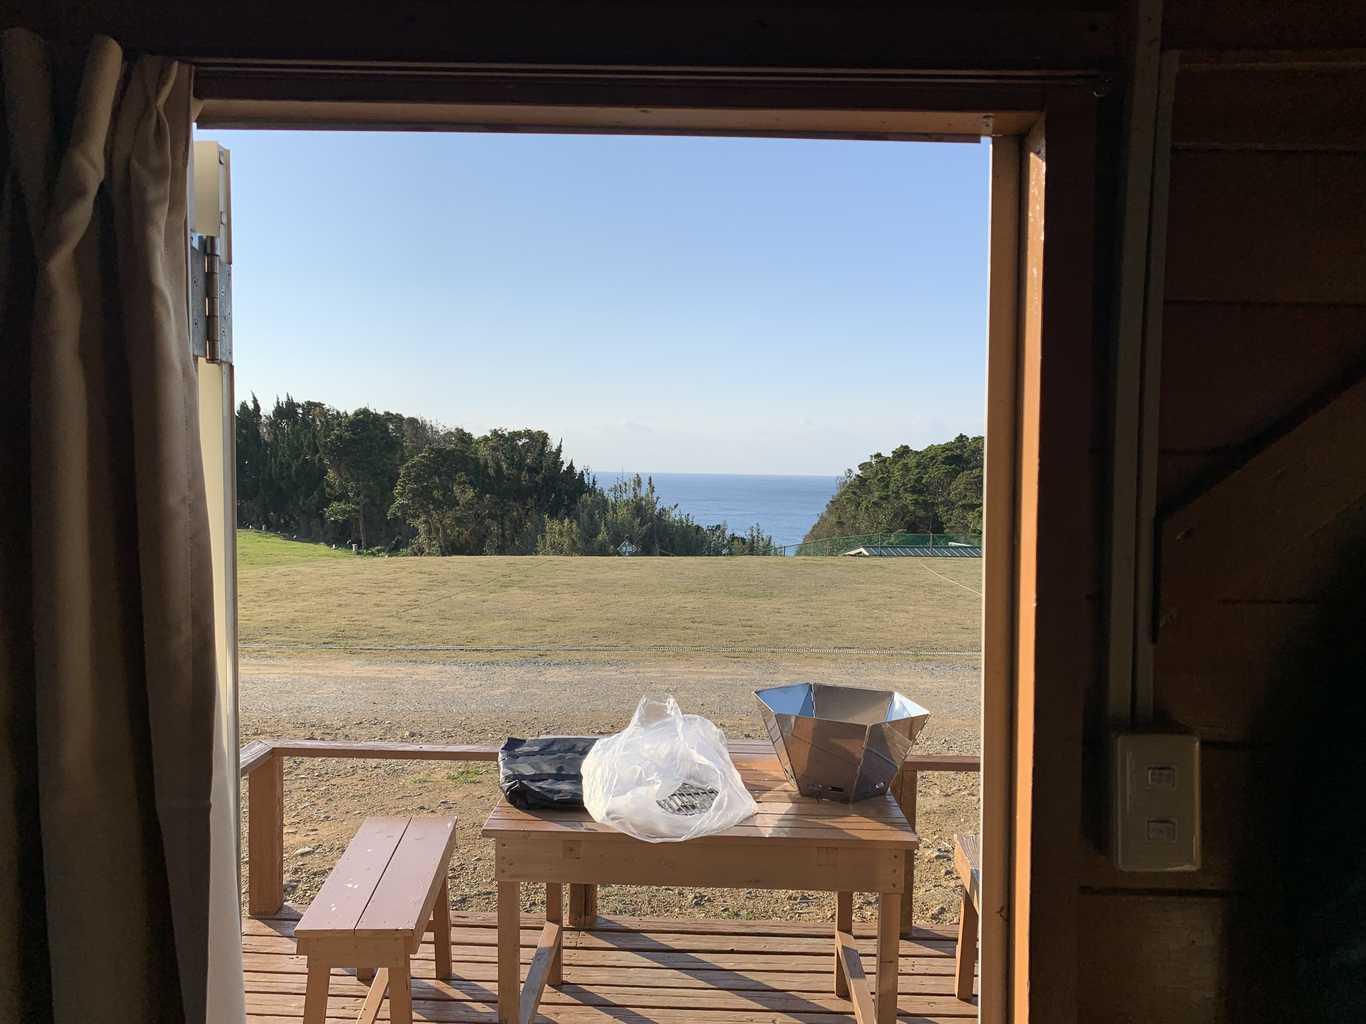 ACN南紀串本リゾート大島 の写真p